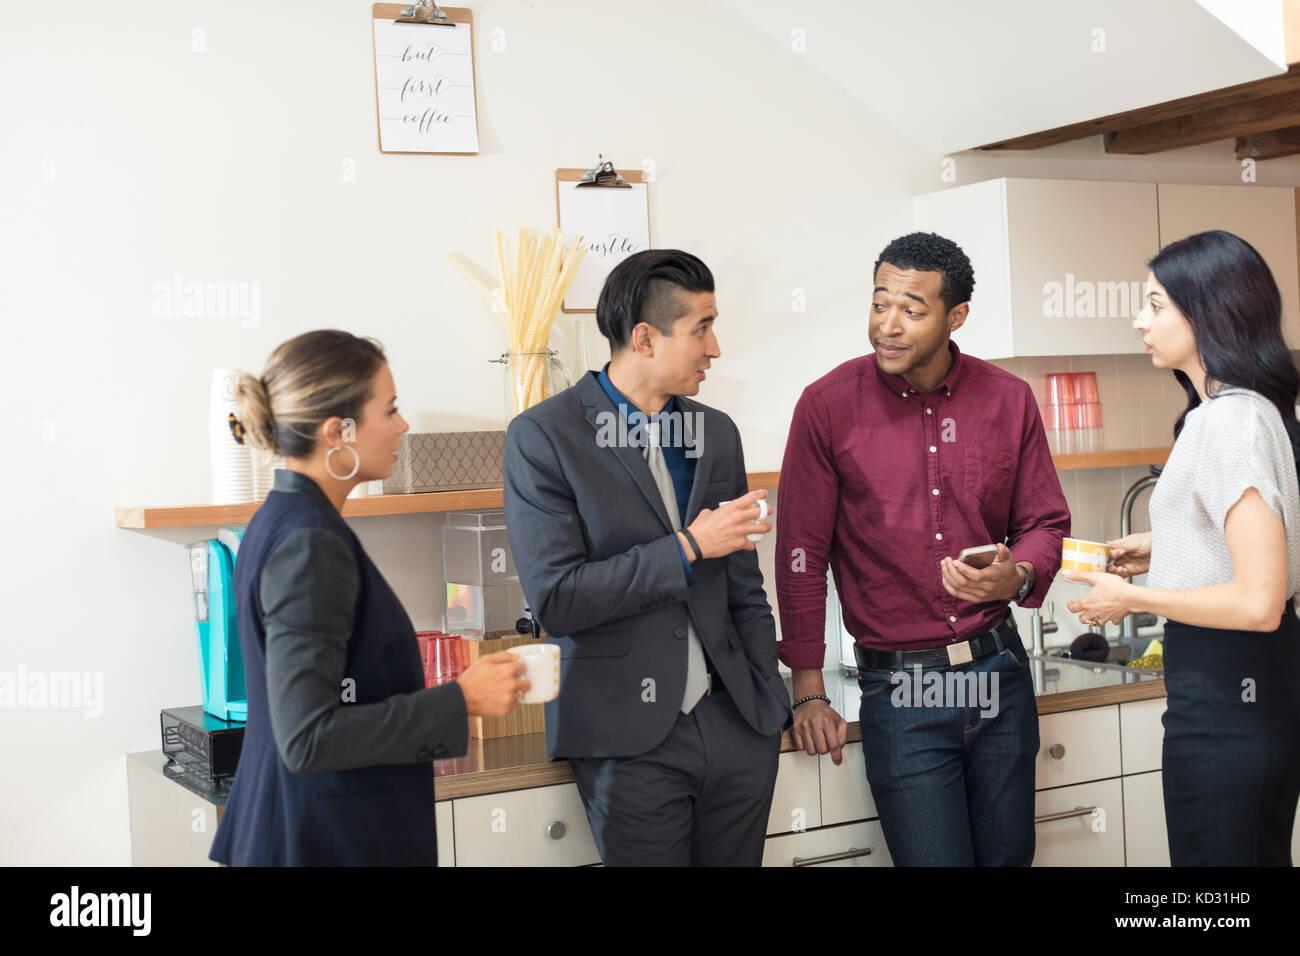 Businesswomen and men having informal meeting in office kitchen - Stock Image